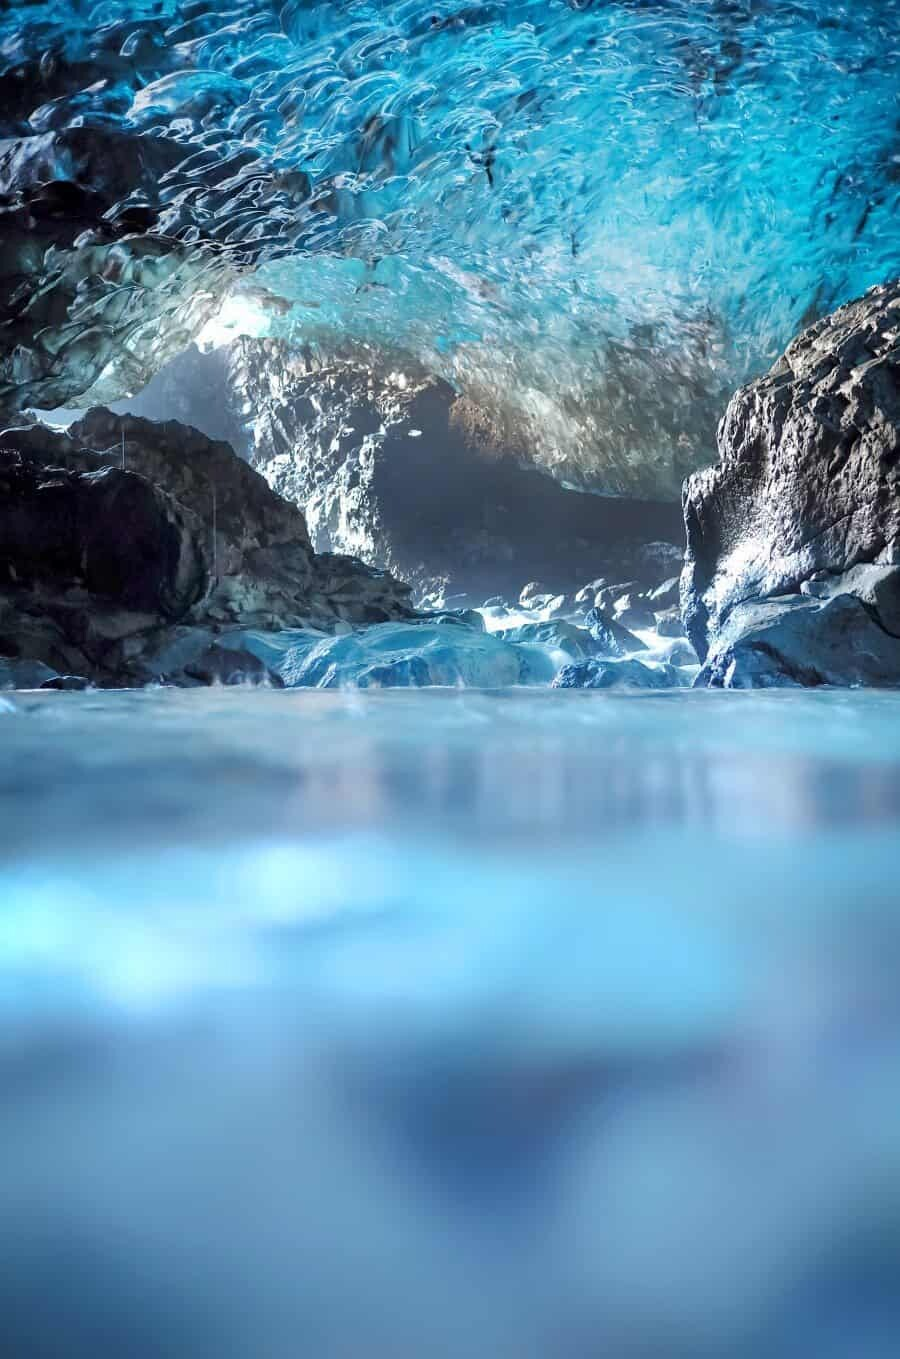 Waterfall Ice Cave, Vatnajokull Glacier, Iceland.